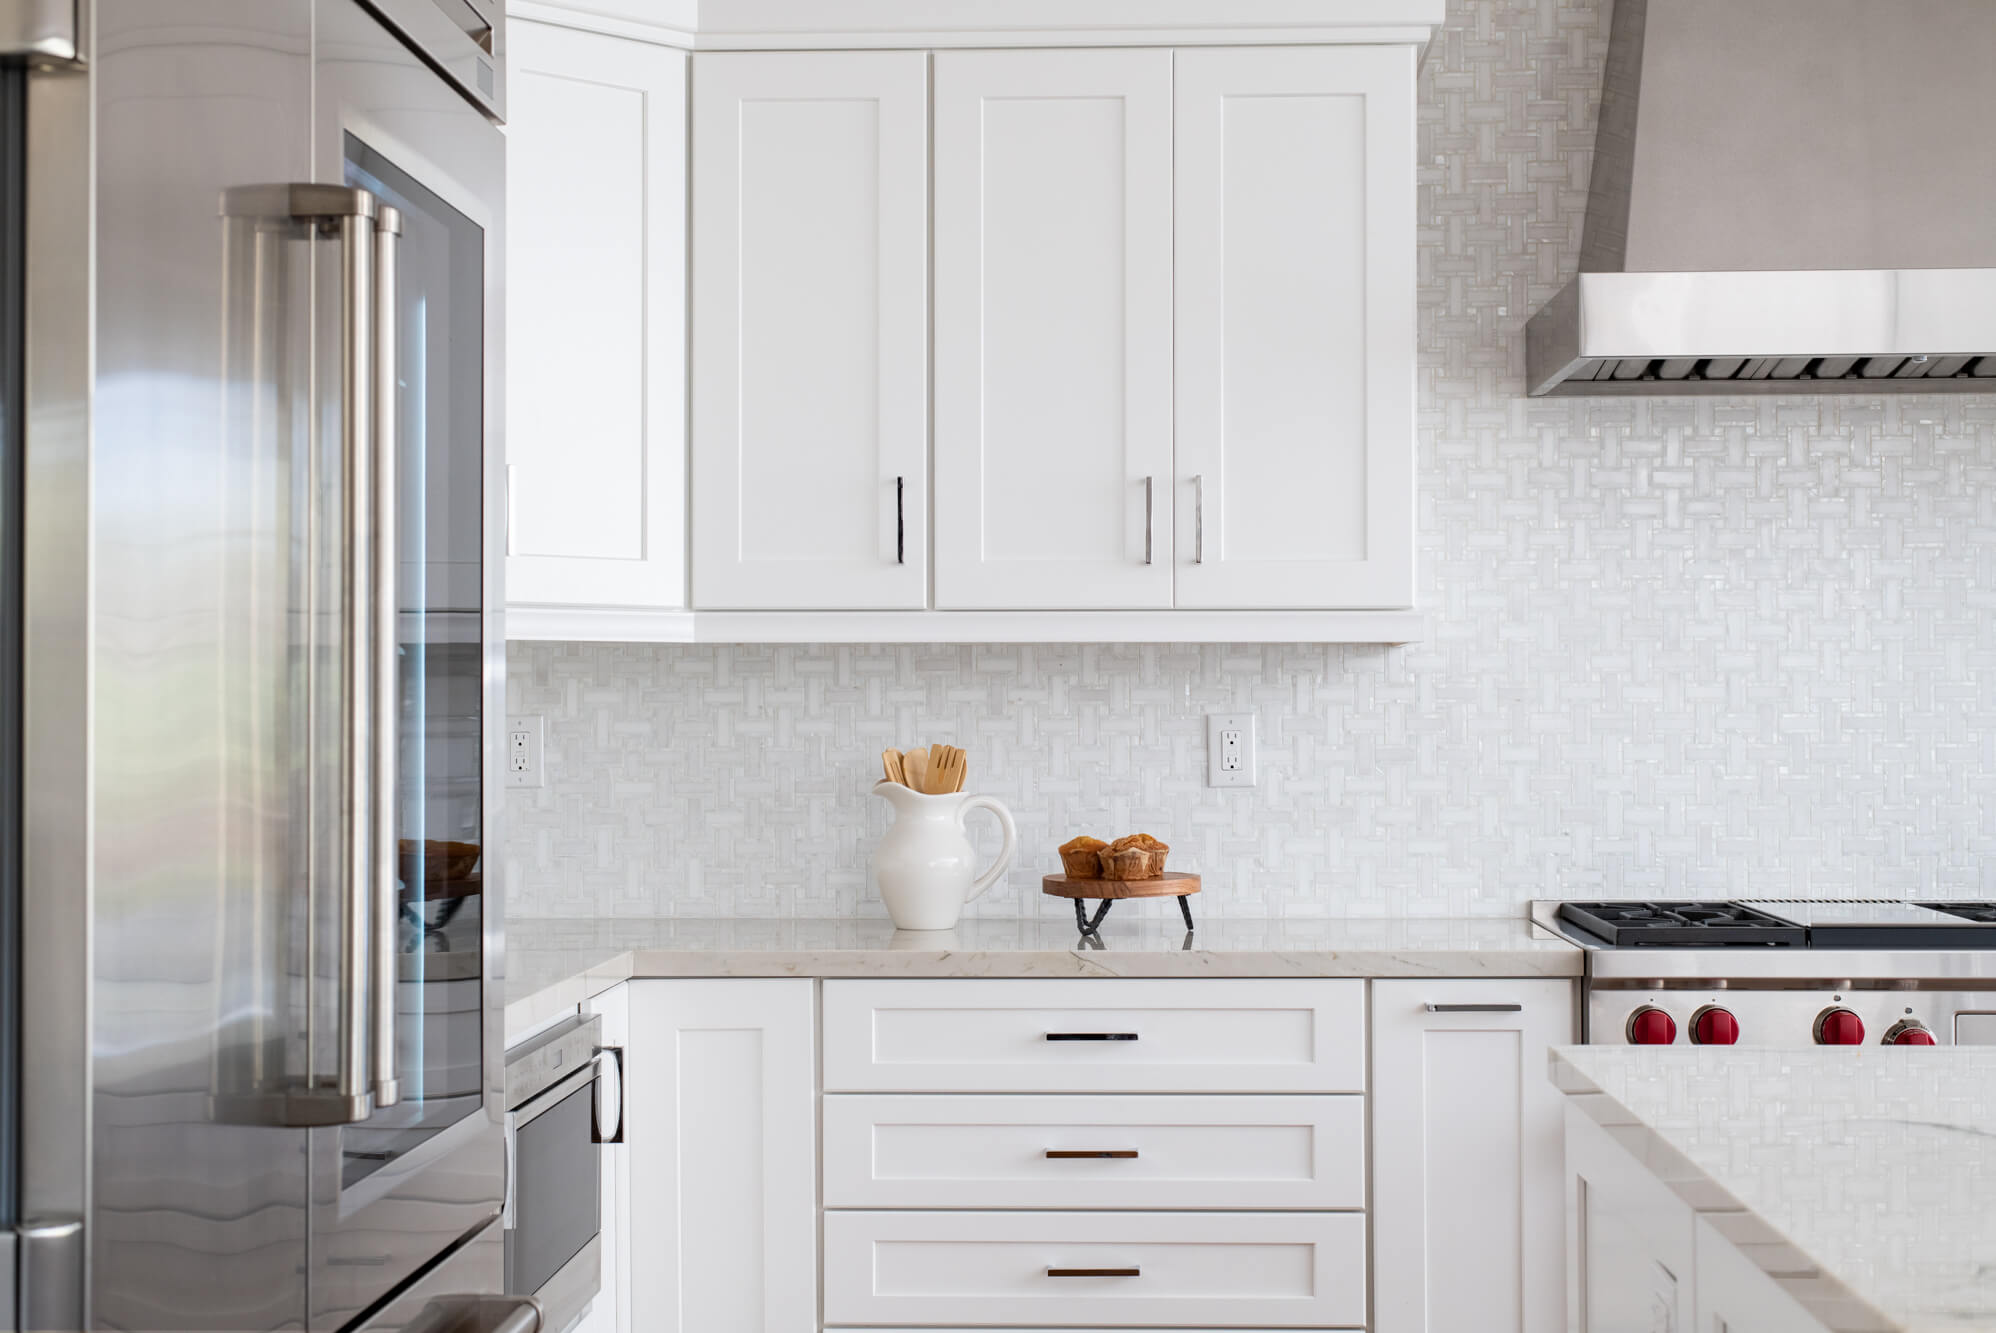 white-Irvine-kitchen-remodel-with-marble-backsplash-tile